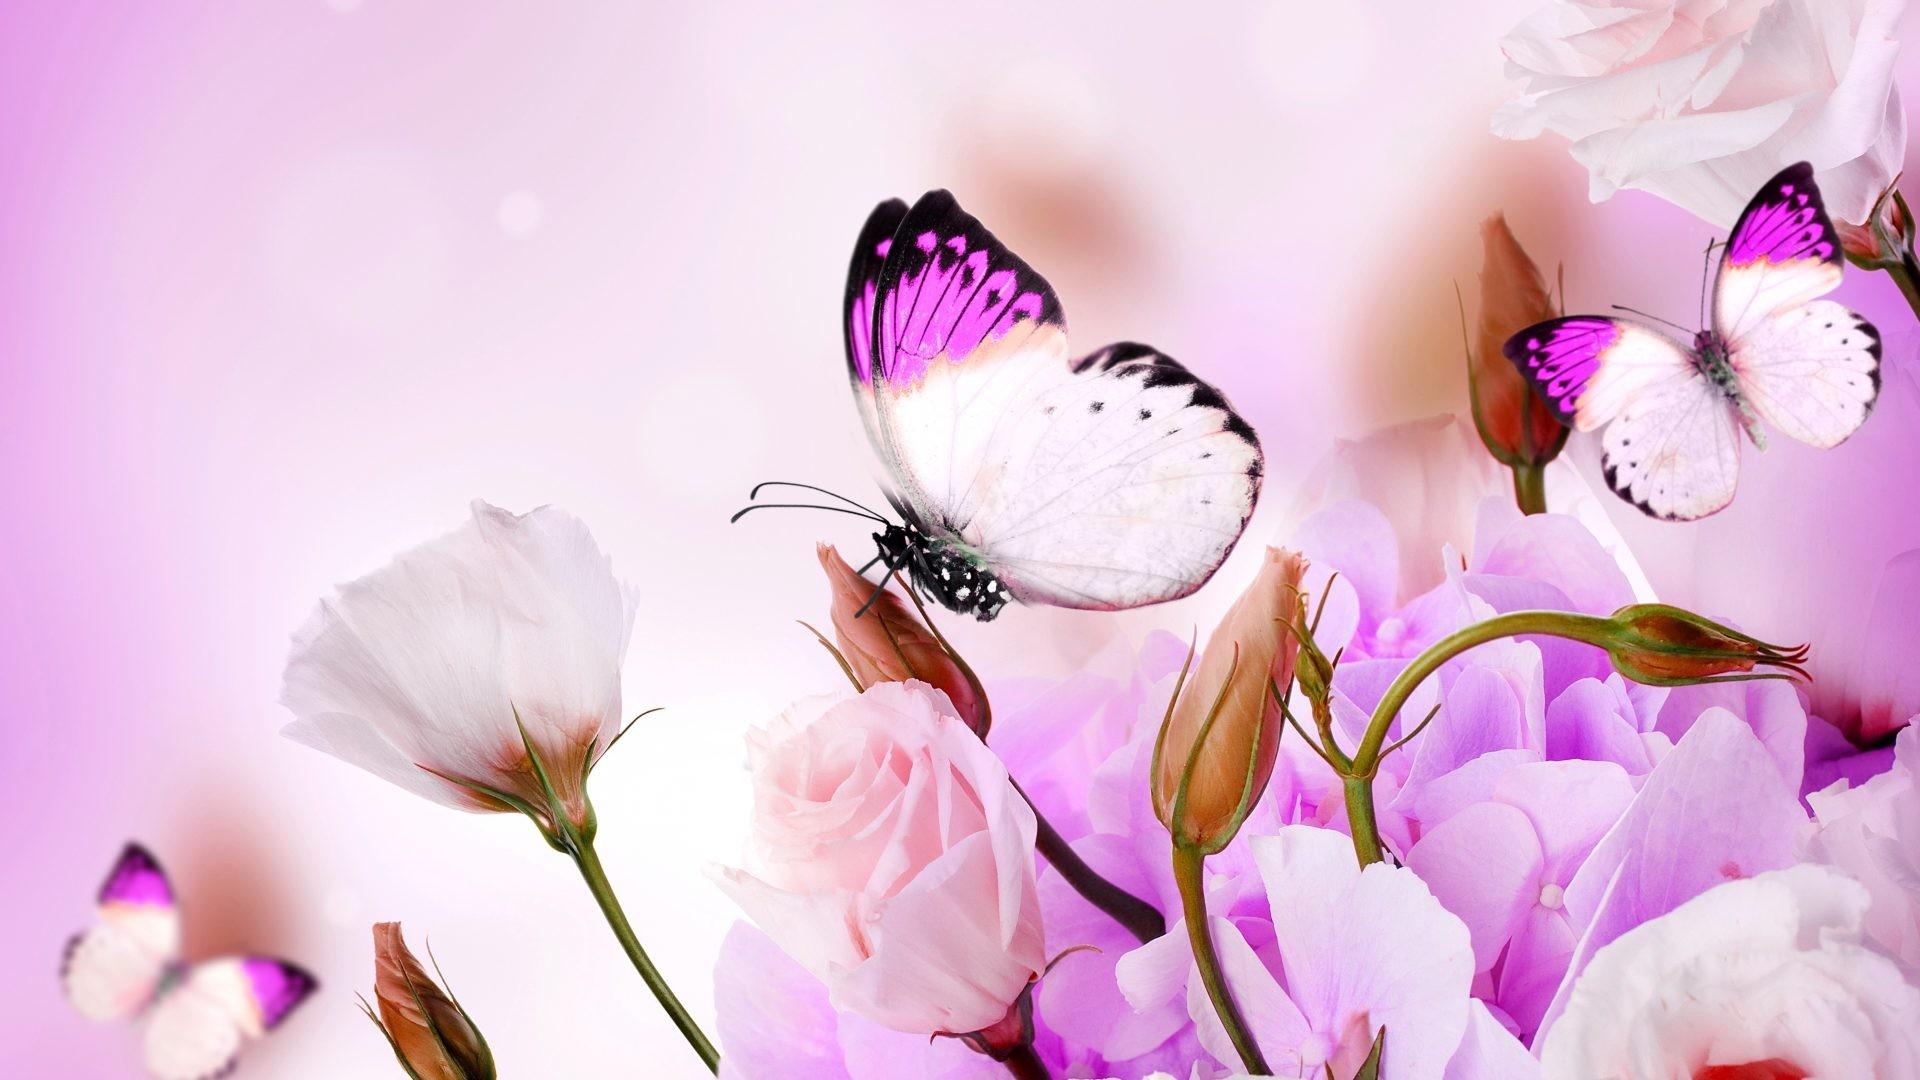 Butterflies Tag – Spring Beautiful Flowers Butterflies Purple Delicate  Flower Wallpaper Macbook for HD 16: